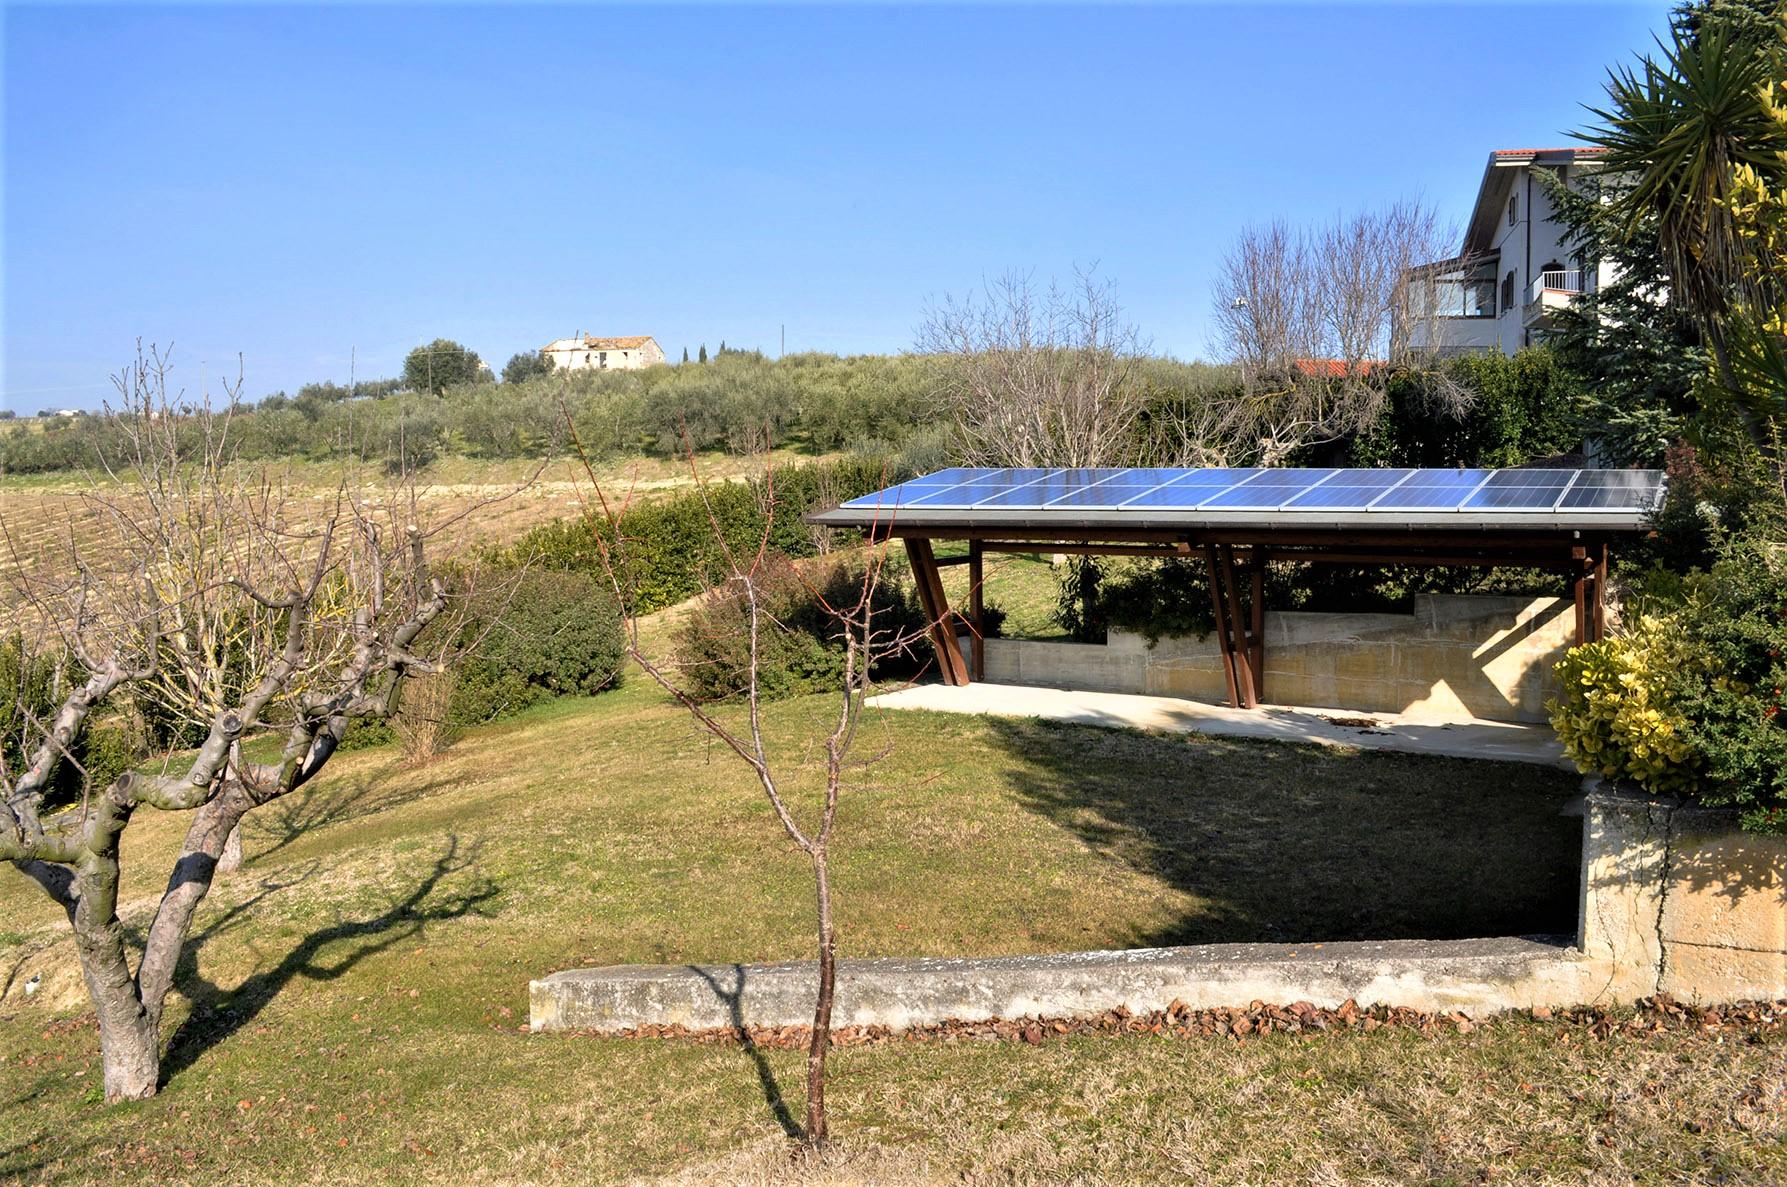 Villa Villa for sale Tortoreto (TE), Villa Bianca - Tortoreto - EUR 770.233 480